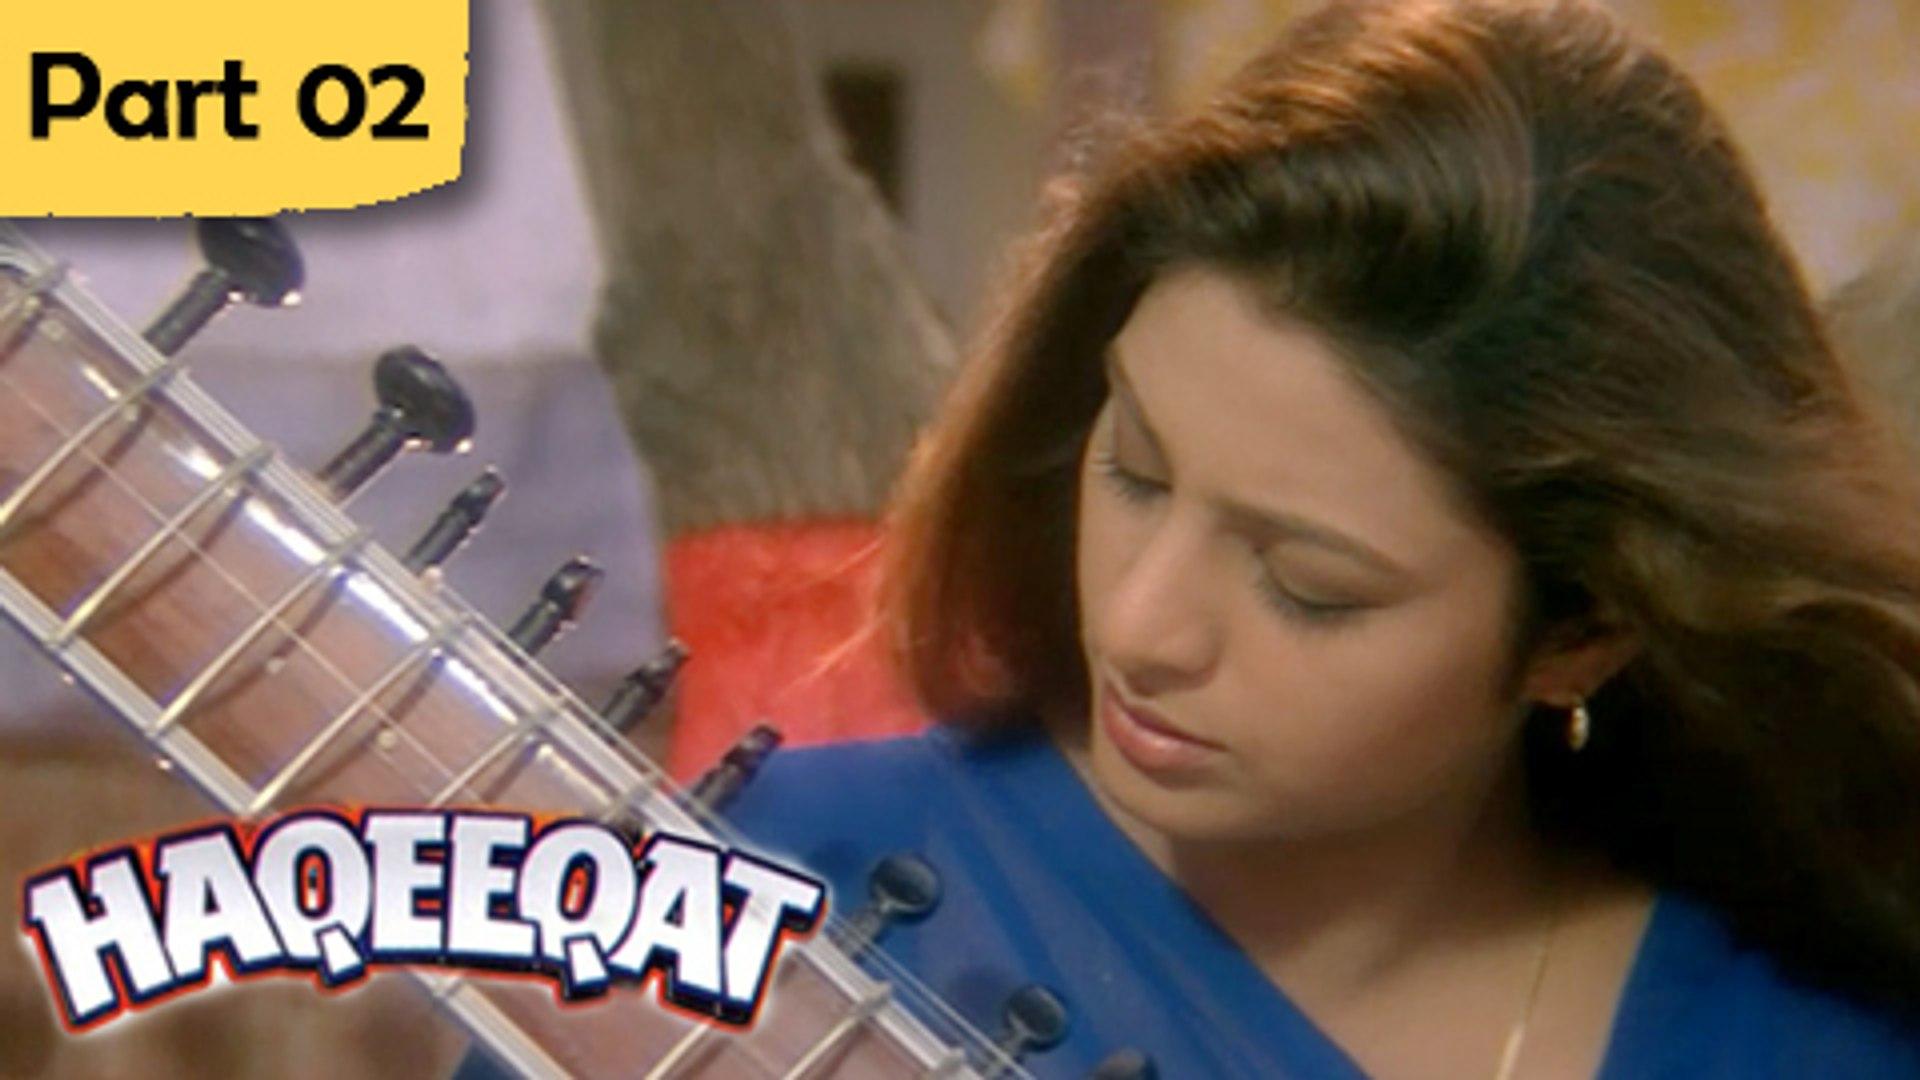 Haqeeqat - Part 02/12 - Bollywood action romantic super hit Hindi movie - Ajay devgan, Tabu